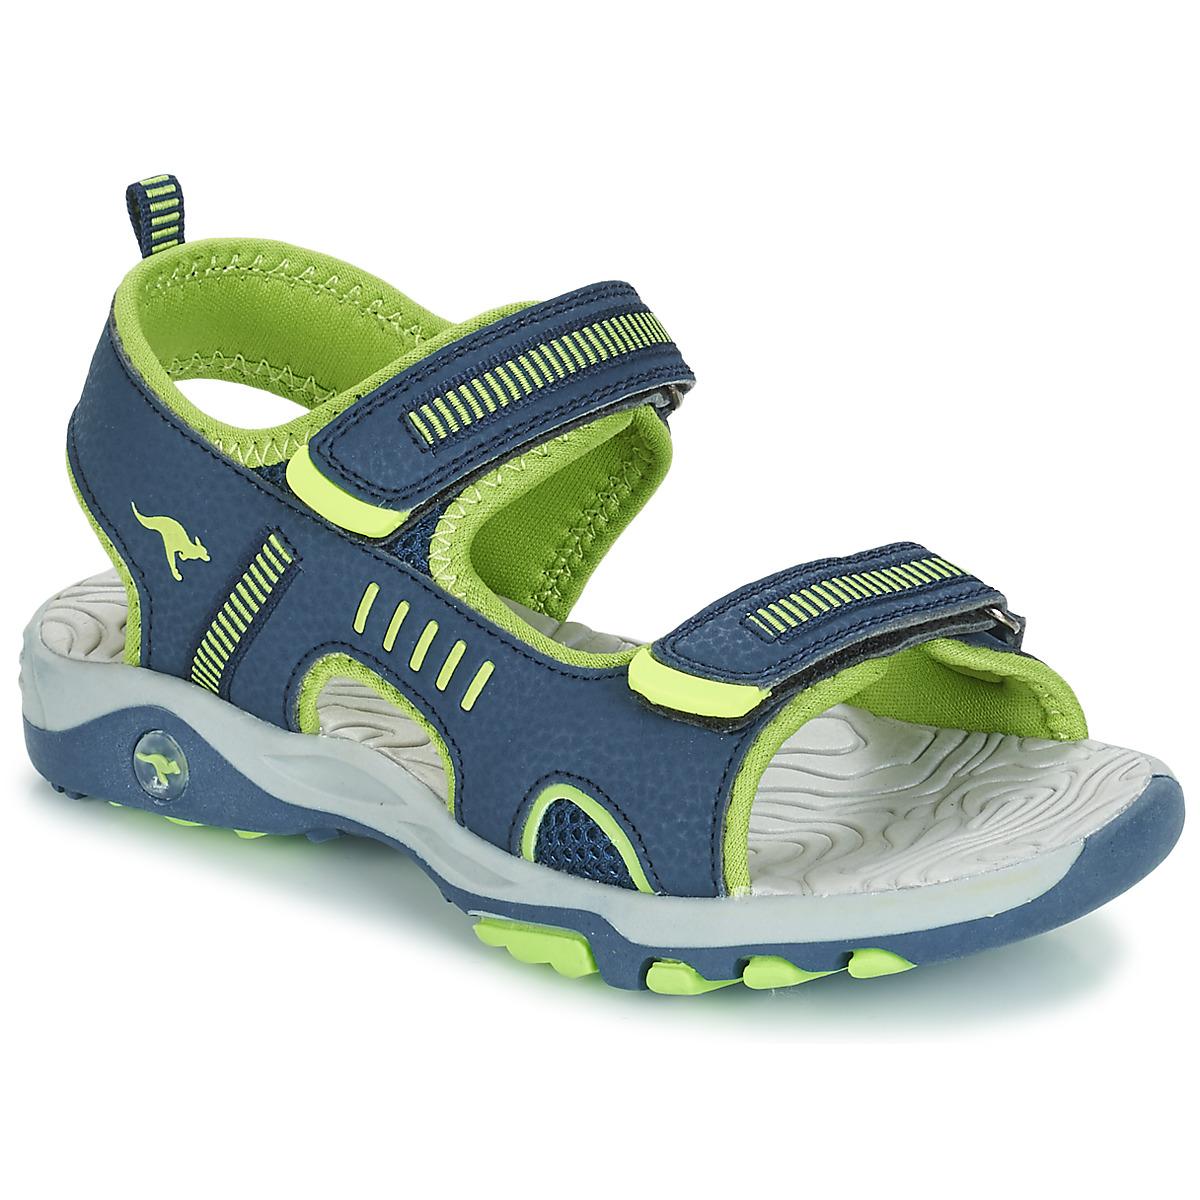 Sandaler til børn Kangaroos  K-LOGAN